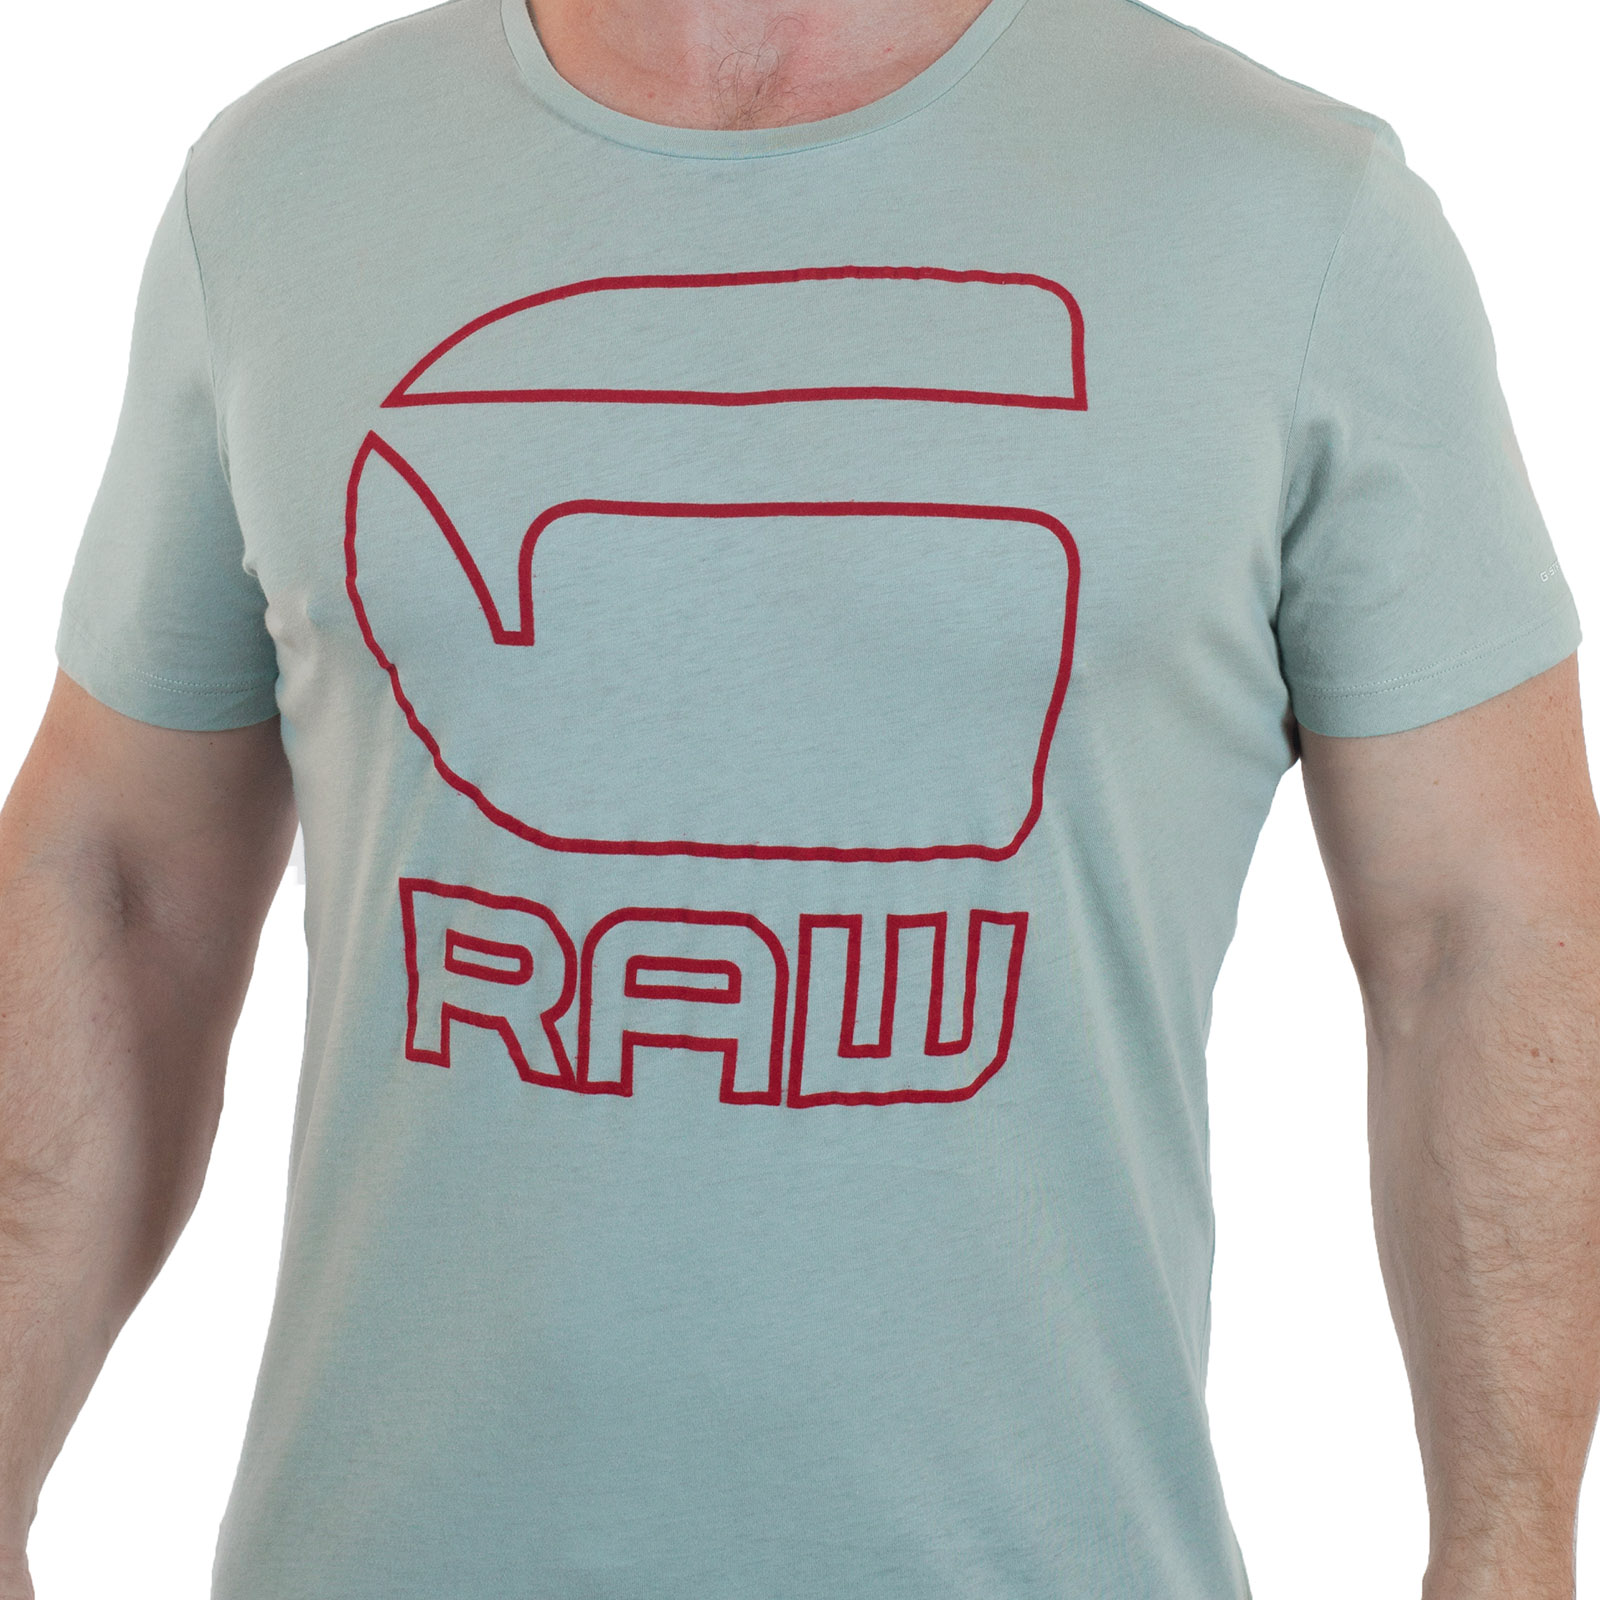 Футболка оригинального цвета с логотипом G-Star Raw®